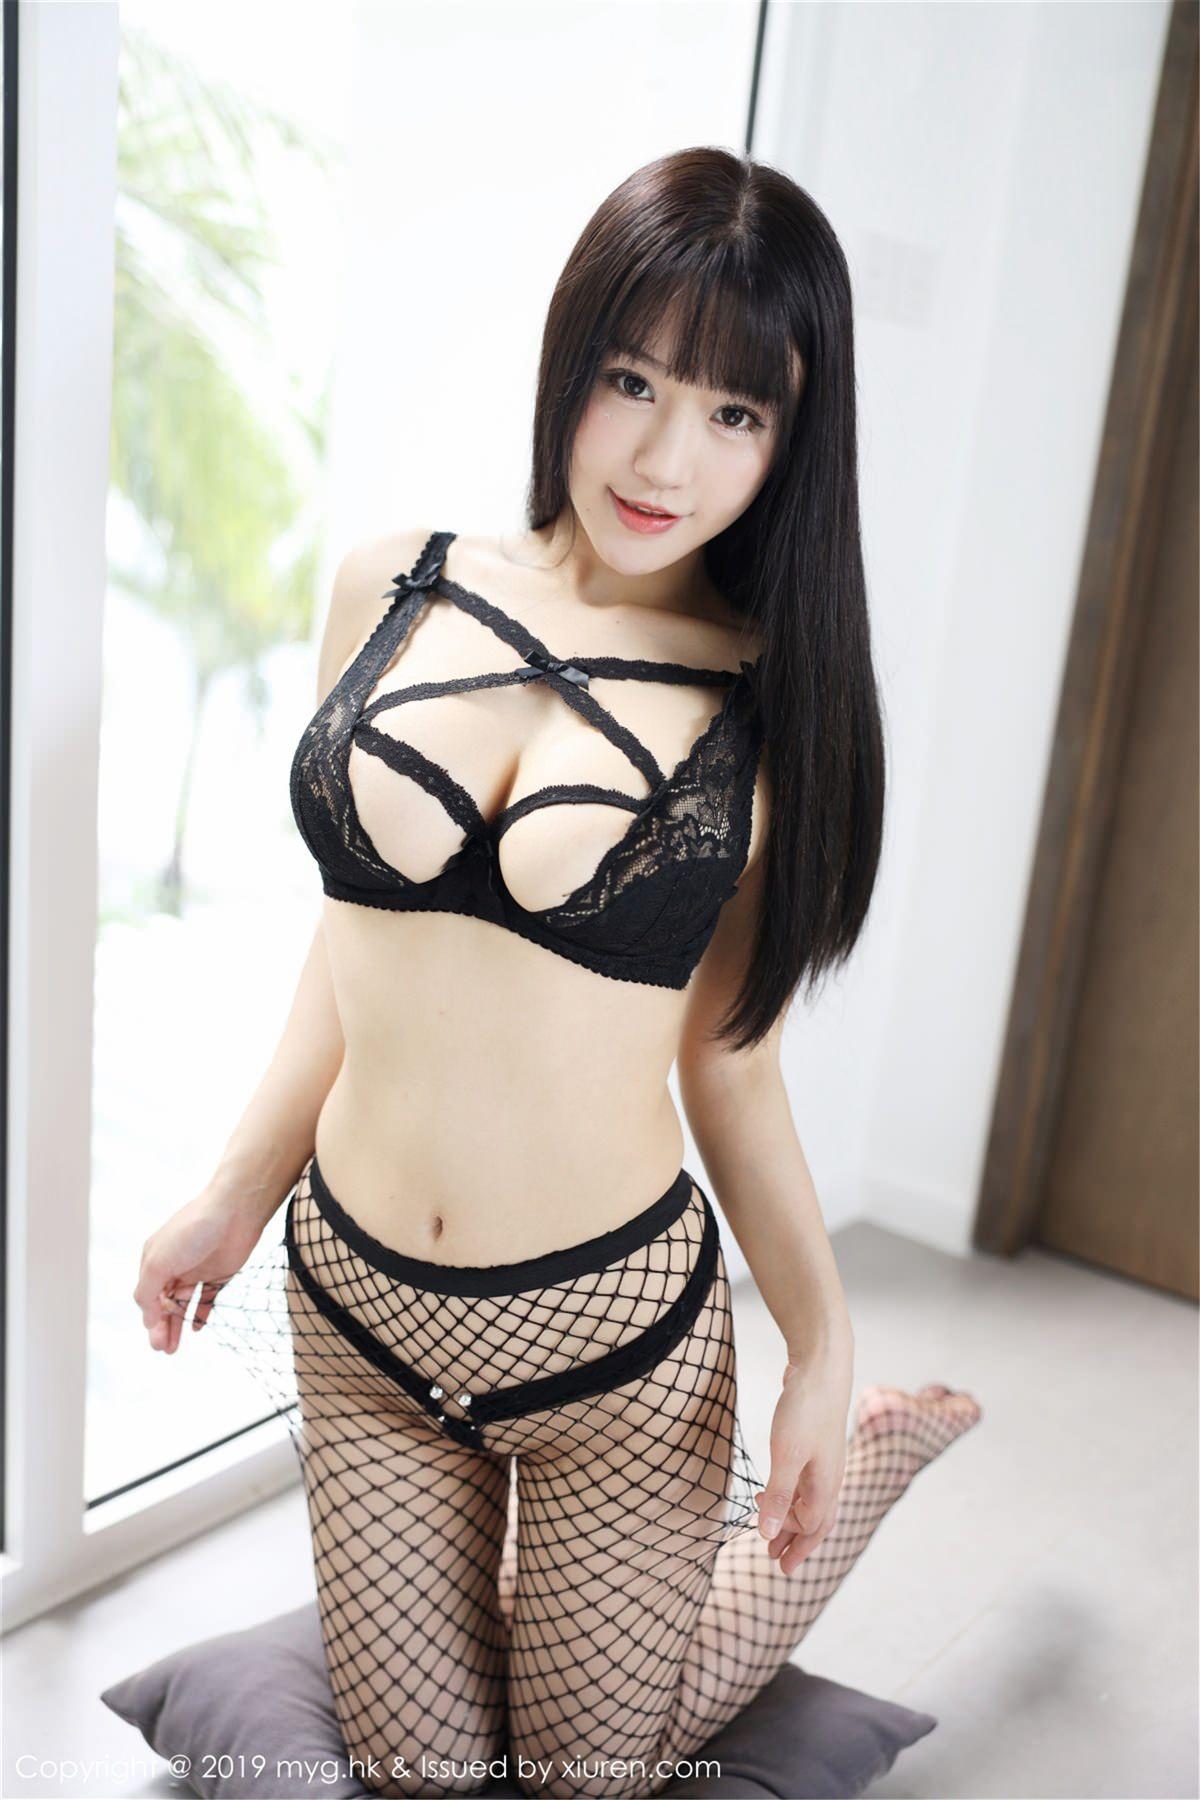 MyGirl Vol.357 20P, mygirl, Zhu Ke Er